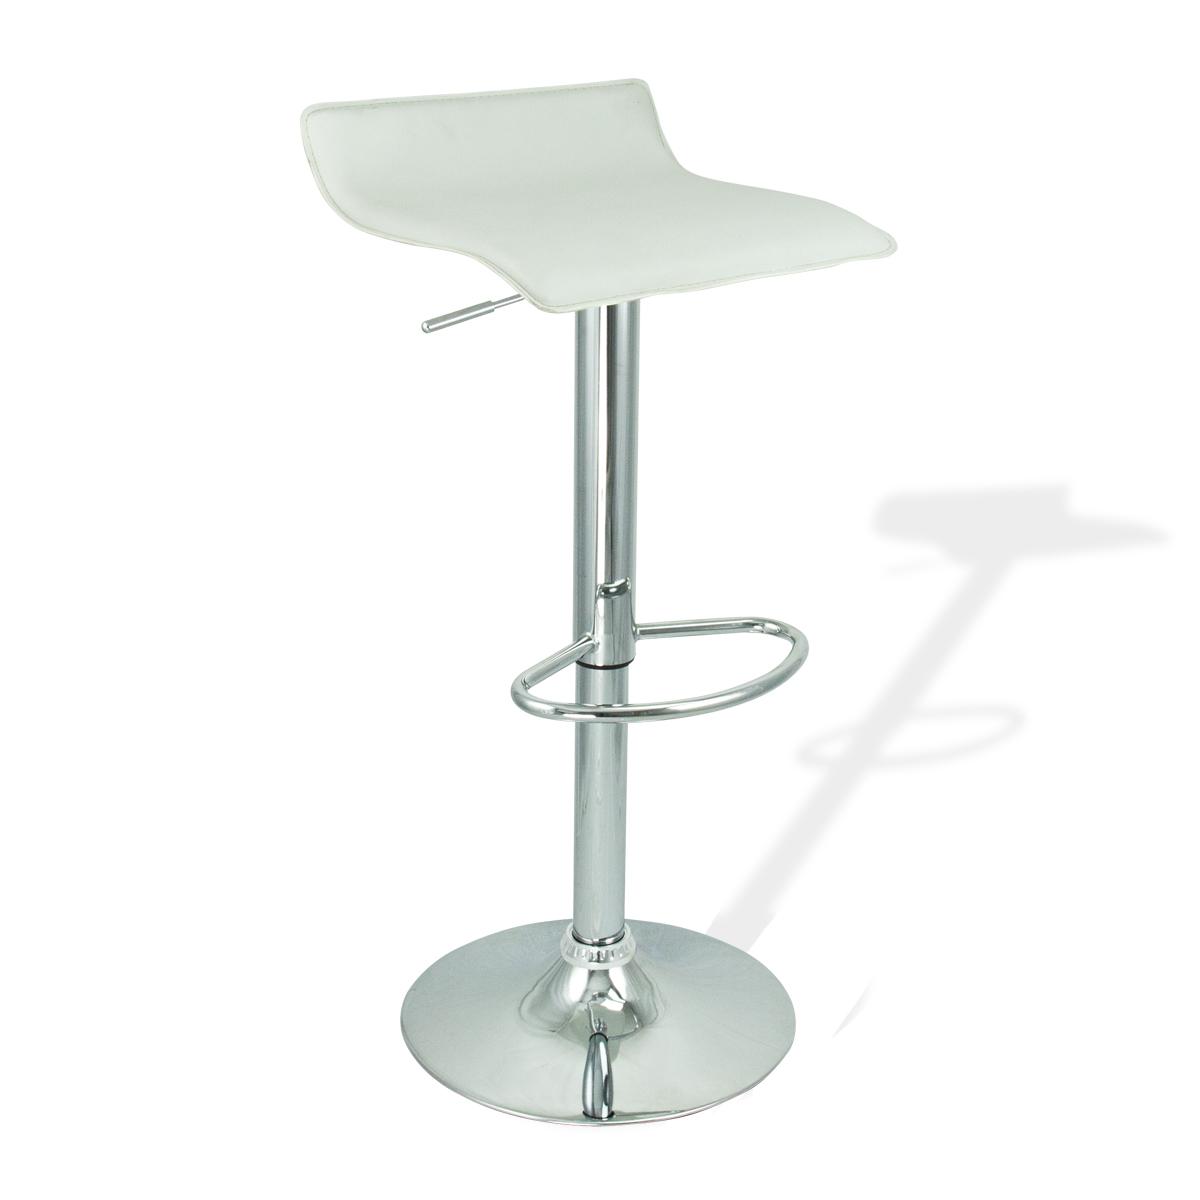 4 new modern bar stool white swivel bombo chair pub